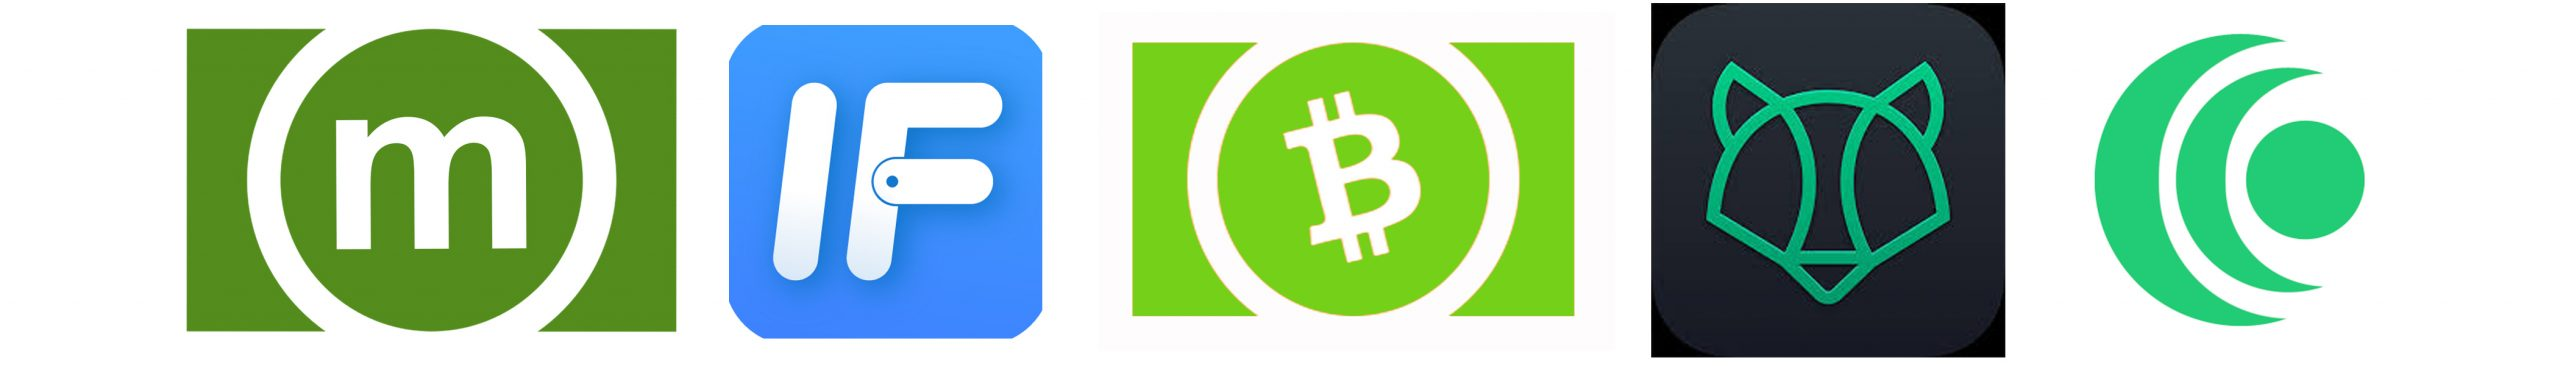 "Cashshuffle y SLP Token Universe brillaron brillantemente en 2019 ""ancho = ""2560"" height = ""366"" srcset = ""https://blackswanfinances.com/wp-content/uploads/2019/12/wallet-support-1-scaled.jpg 2560w, https: //news.bitcoin. com / wp-content / uploads / 2019/12 / wallet-support-1-300x43.jpg 300w, https://news.bitcoin.com/wp-content/uploads/2019/12/wallet-support-1-1024x146 .jpg 1024w, https://news.bitcoin.com/wp-content/uploads/2019/12/wallet-support-1-768x110.jpg 768w, https://news.bitcoin.com/wp-content/uploads /2019/12/wallet-support-1-1536x219.jpg 1536w, https://news.bitcoin.com/wp-content/uploads/2019/12/wallet-support-1-2048x293.jpg 2048w, https: / /news.bitcoin.com/wp-content/uploads/2019/12/wallet-support-1-696x99.jpg 696w, https://news.bitcoin.com/wp-content/uploads/2019/12/wallet- support-1-1392x199.jpg 1392w, https://news.bitcoin.com/wp-content/up cargas / 2019/12 / wallet-support-1-1068x153.jpg 1068w, https://news.bitcoin.com/wp-content/uploads/2019/12/wallet-support-1-1920x274.jpg 1920w ""tamaños = ""(ancho máximo: 2560 px) 100vw, 2560 px"